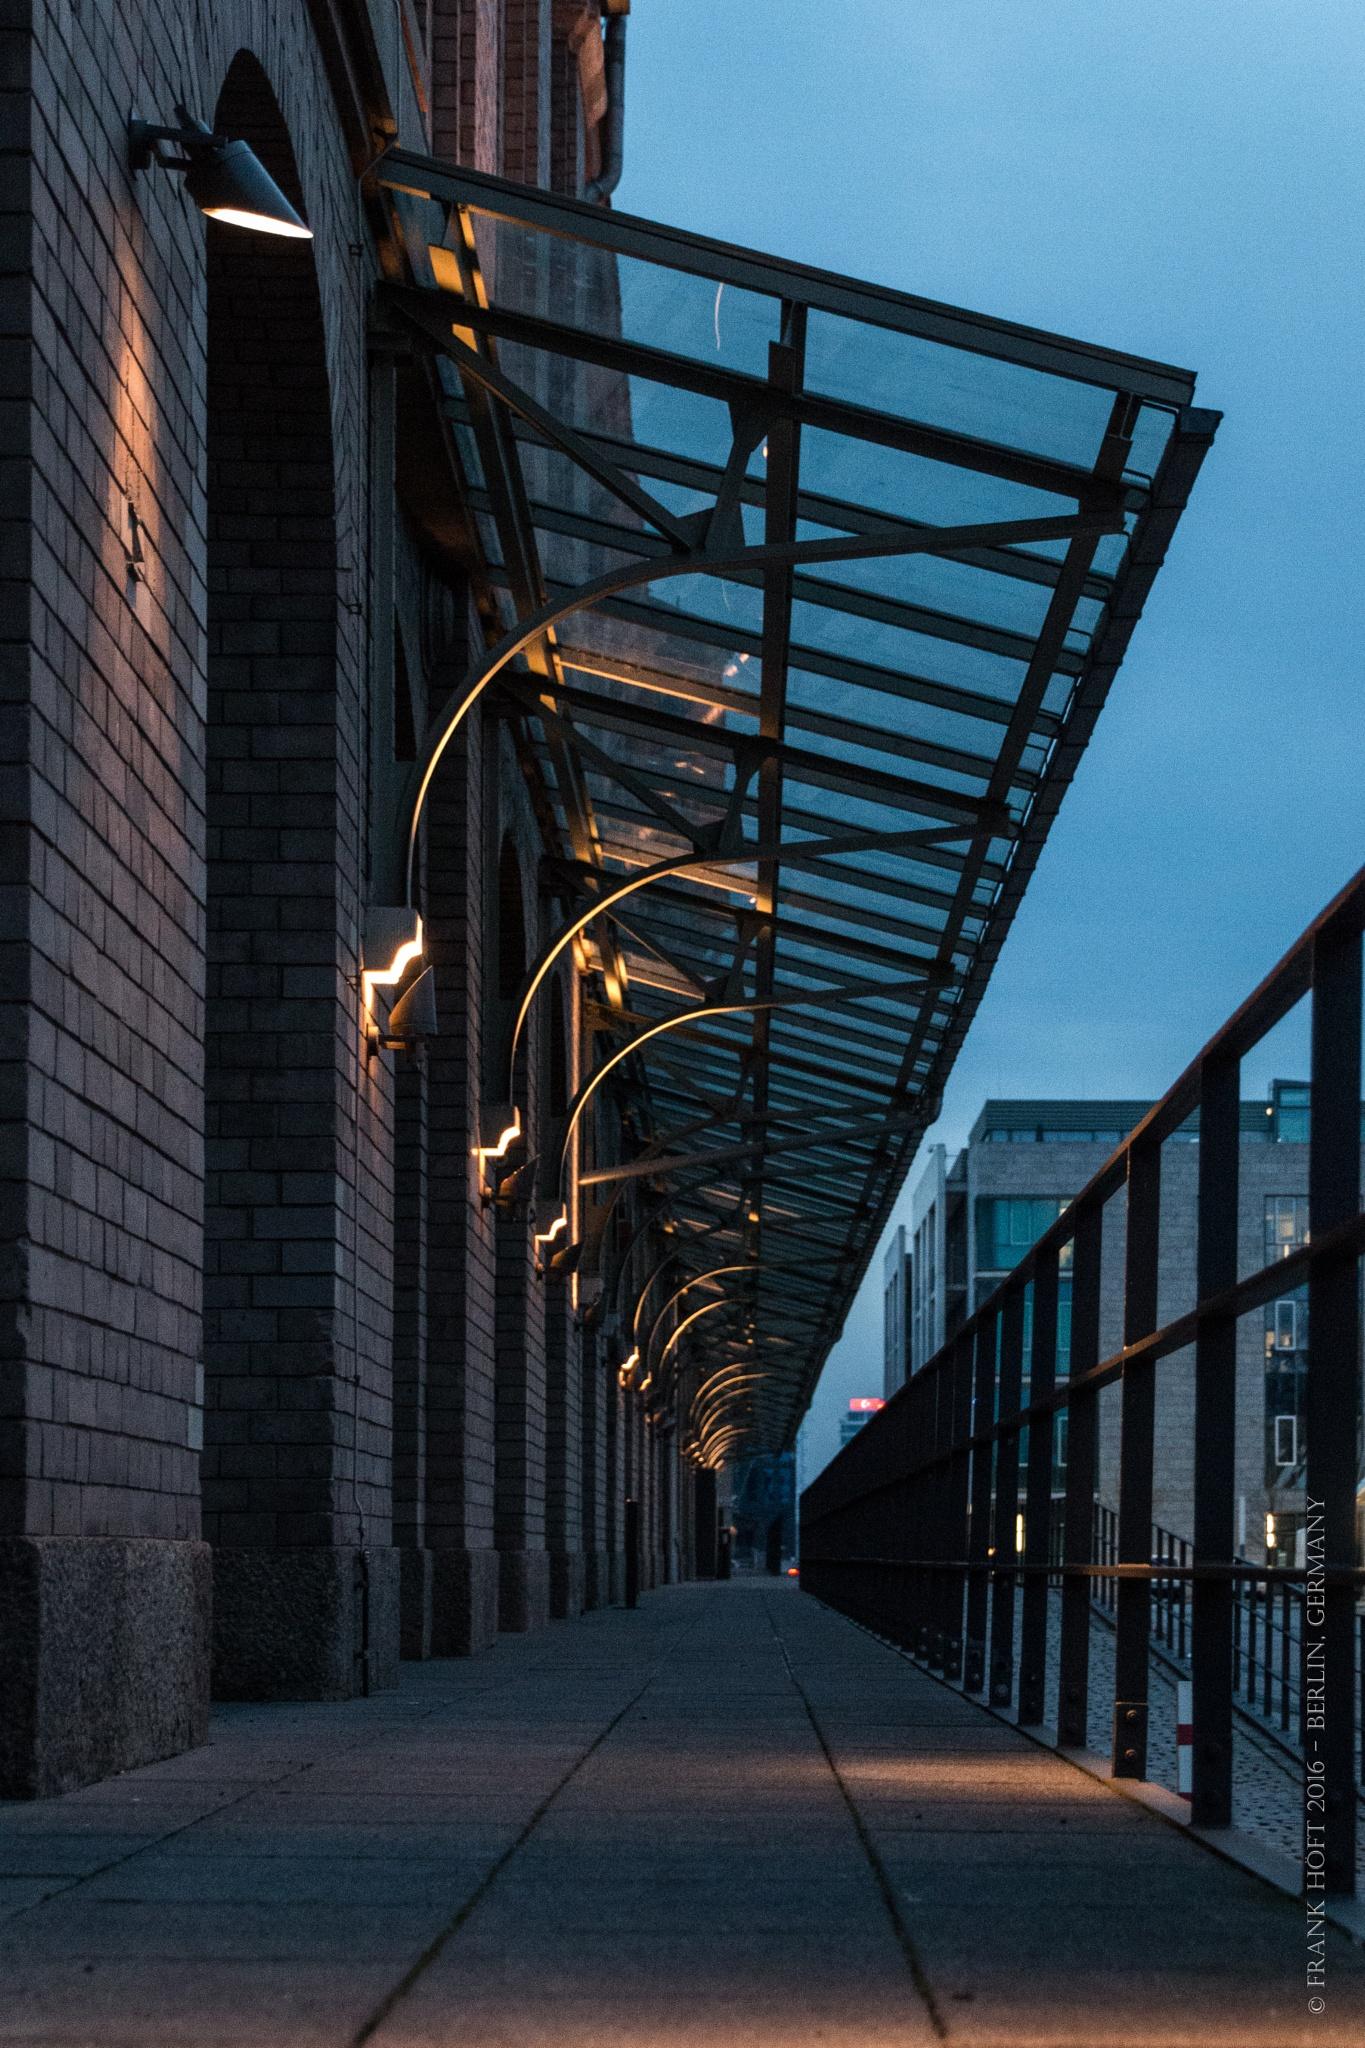 Berlin, Osthafen in the evening by Frank Höft